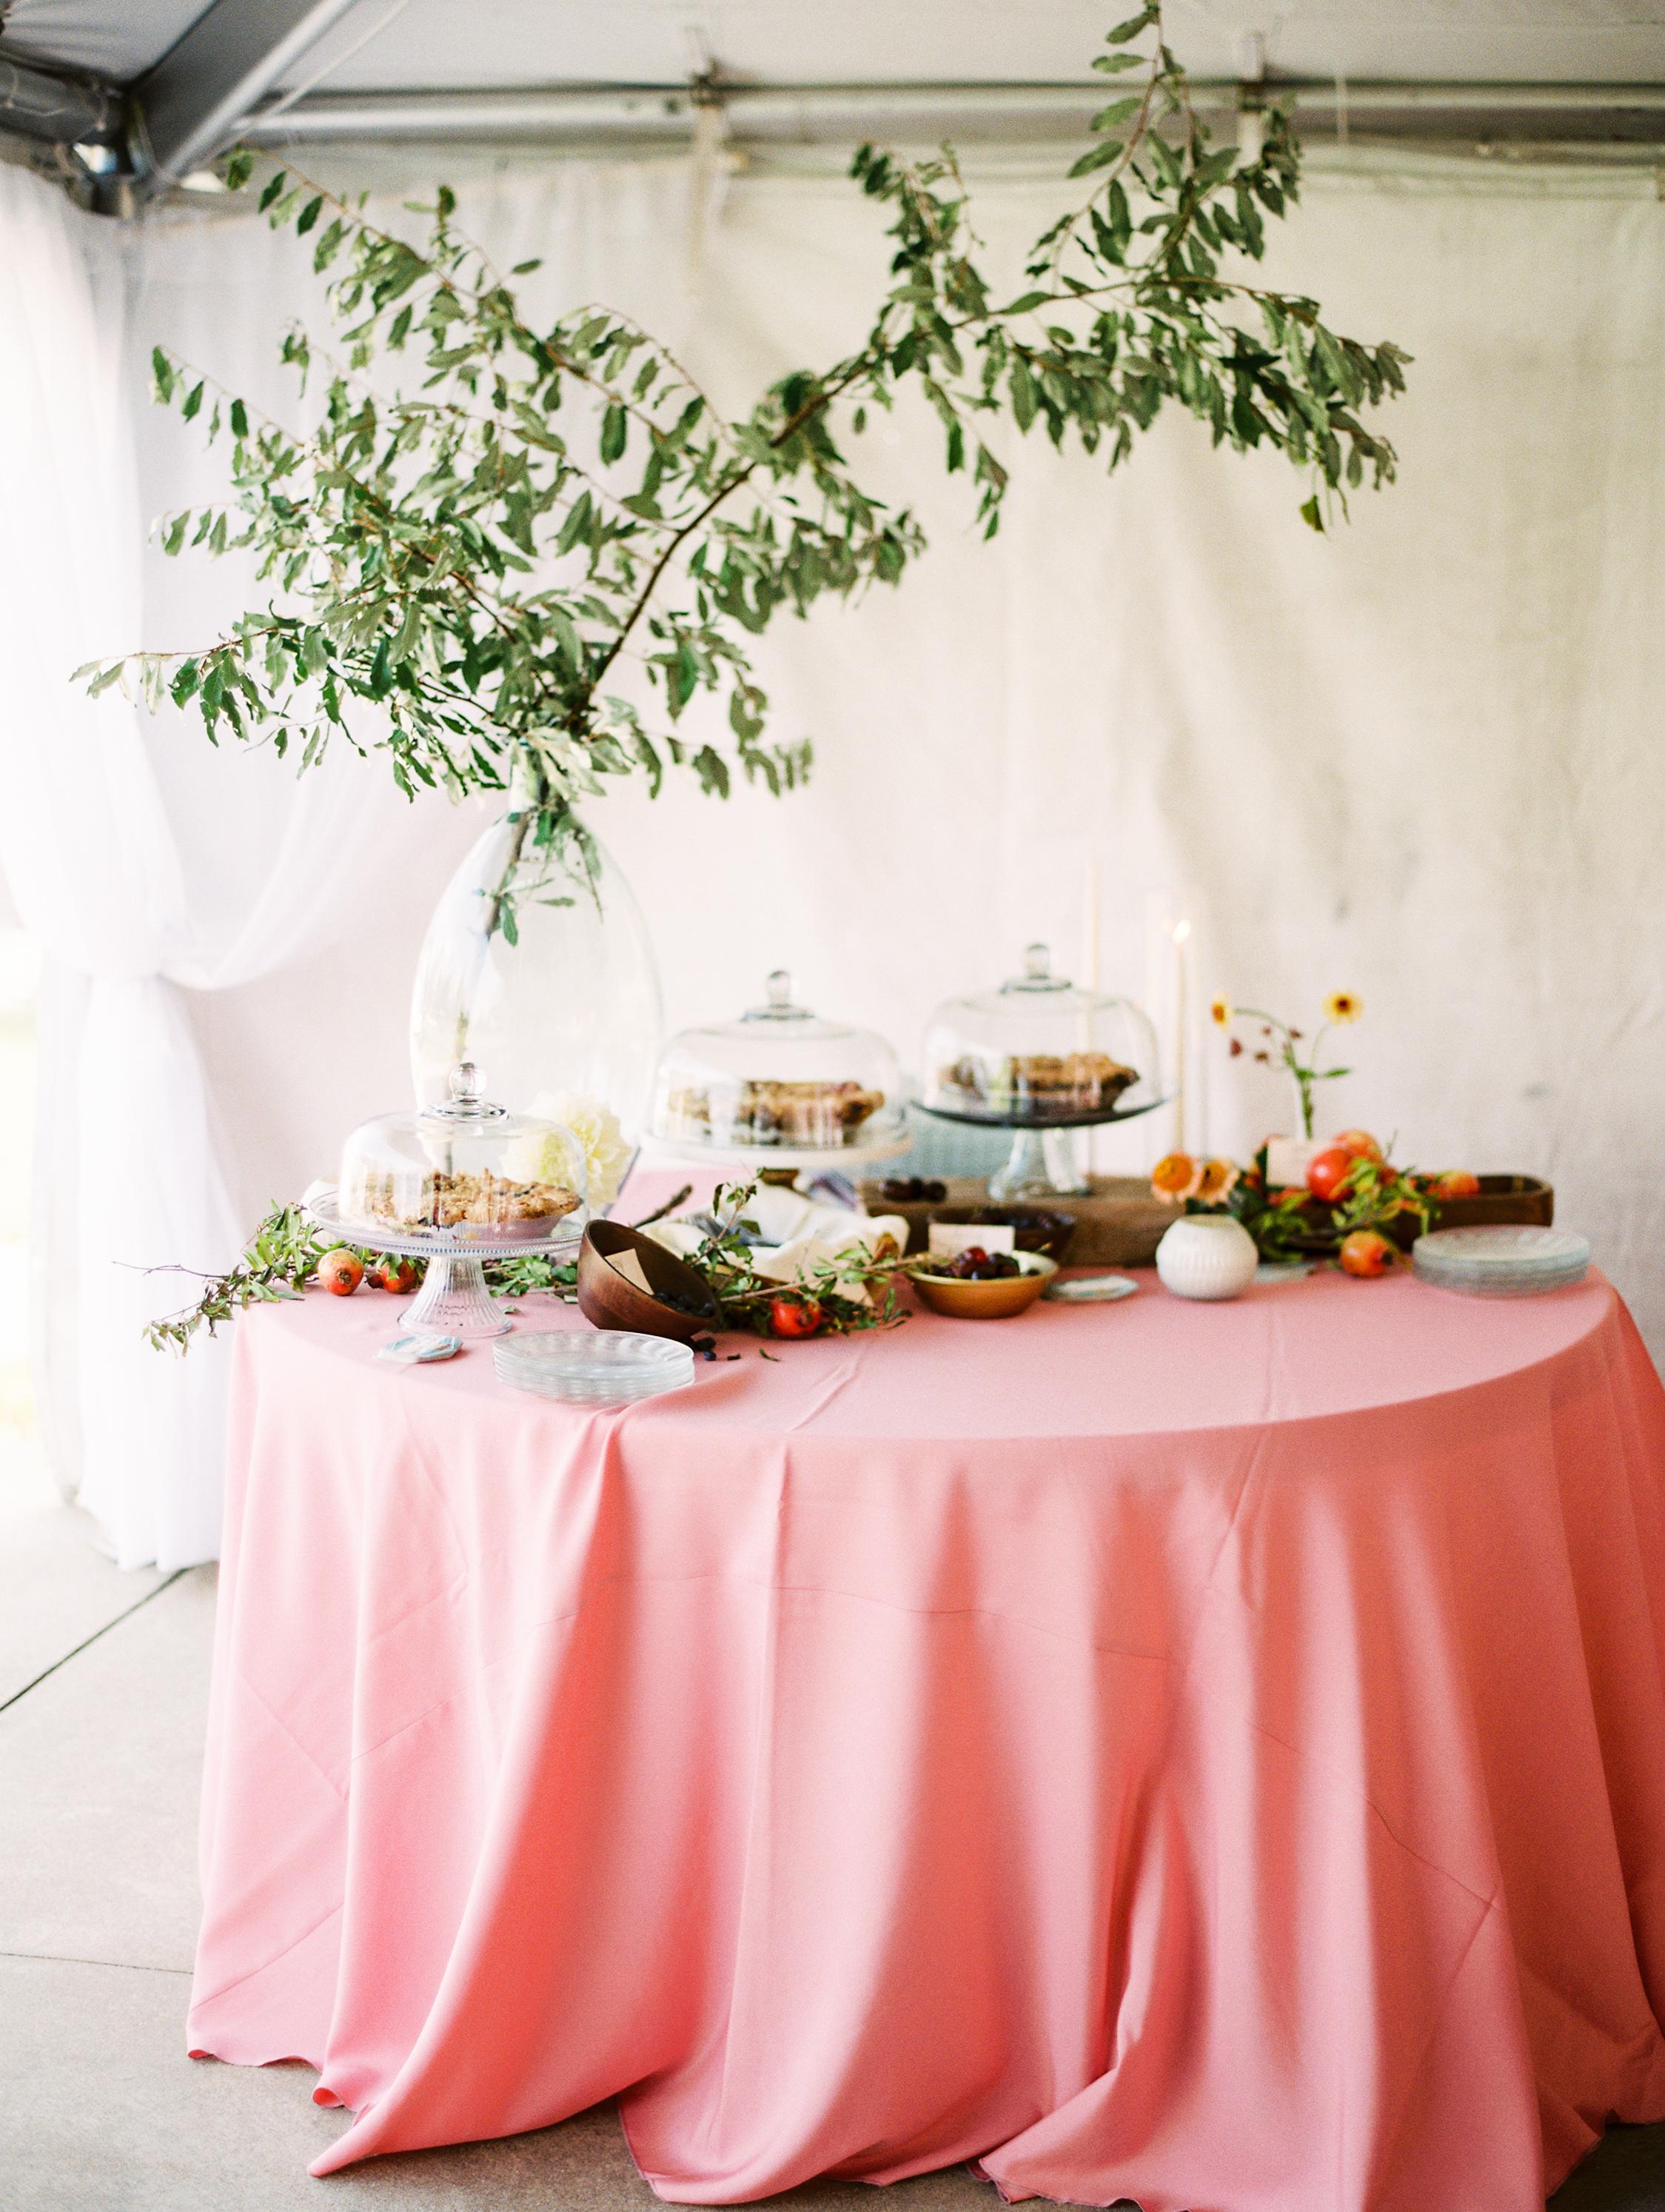 Zoller+Wedding+Reception+Detailsf-3.jpg